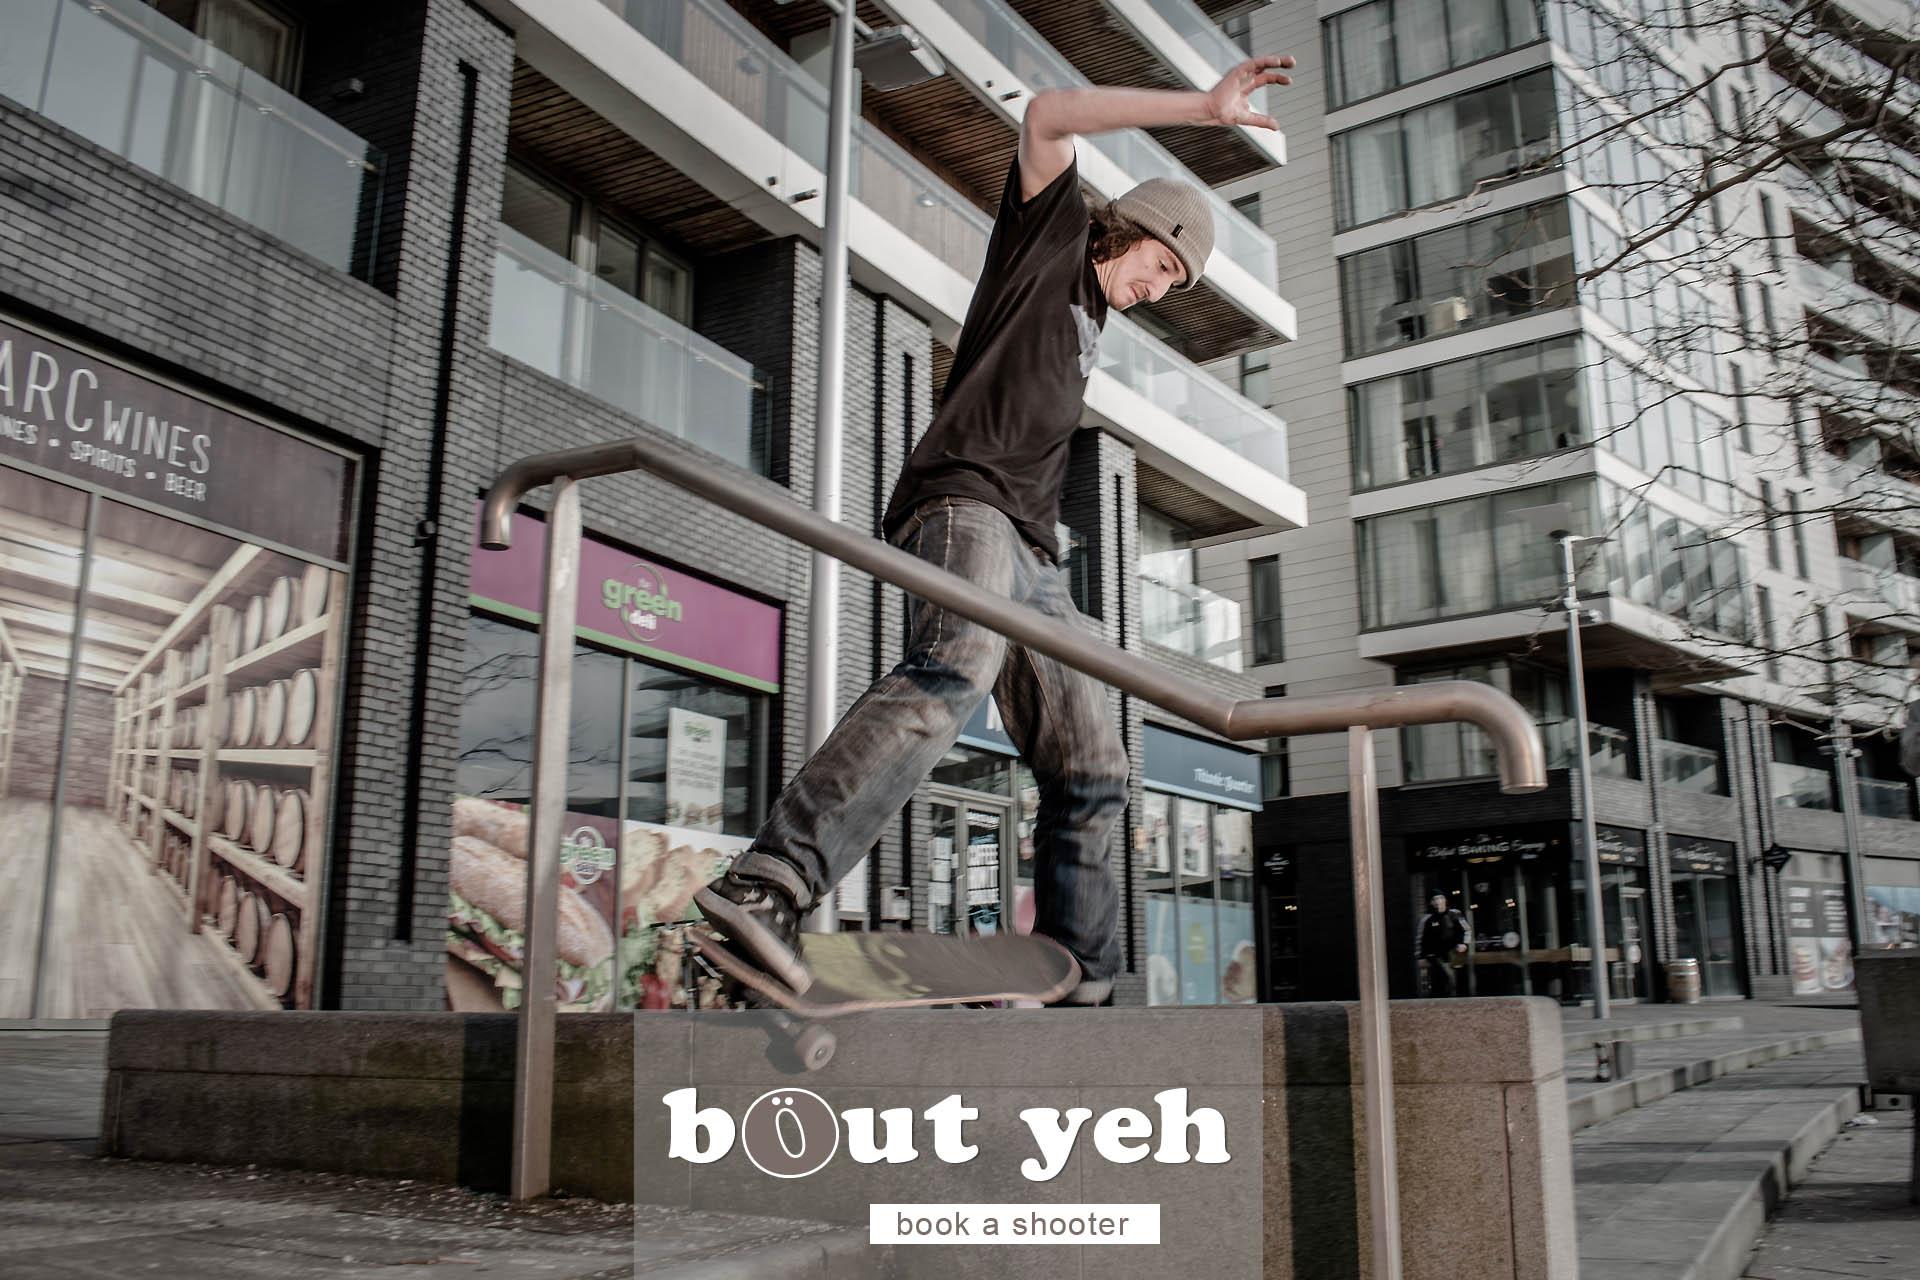 Gerry with skateboard, Titanic Quarter, Belfast - photo 5061.